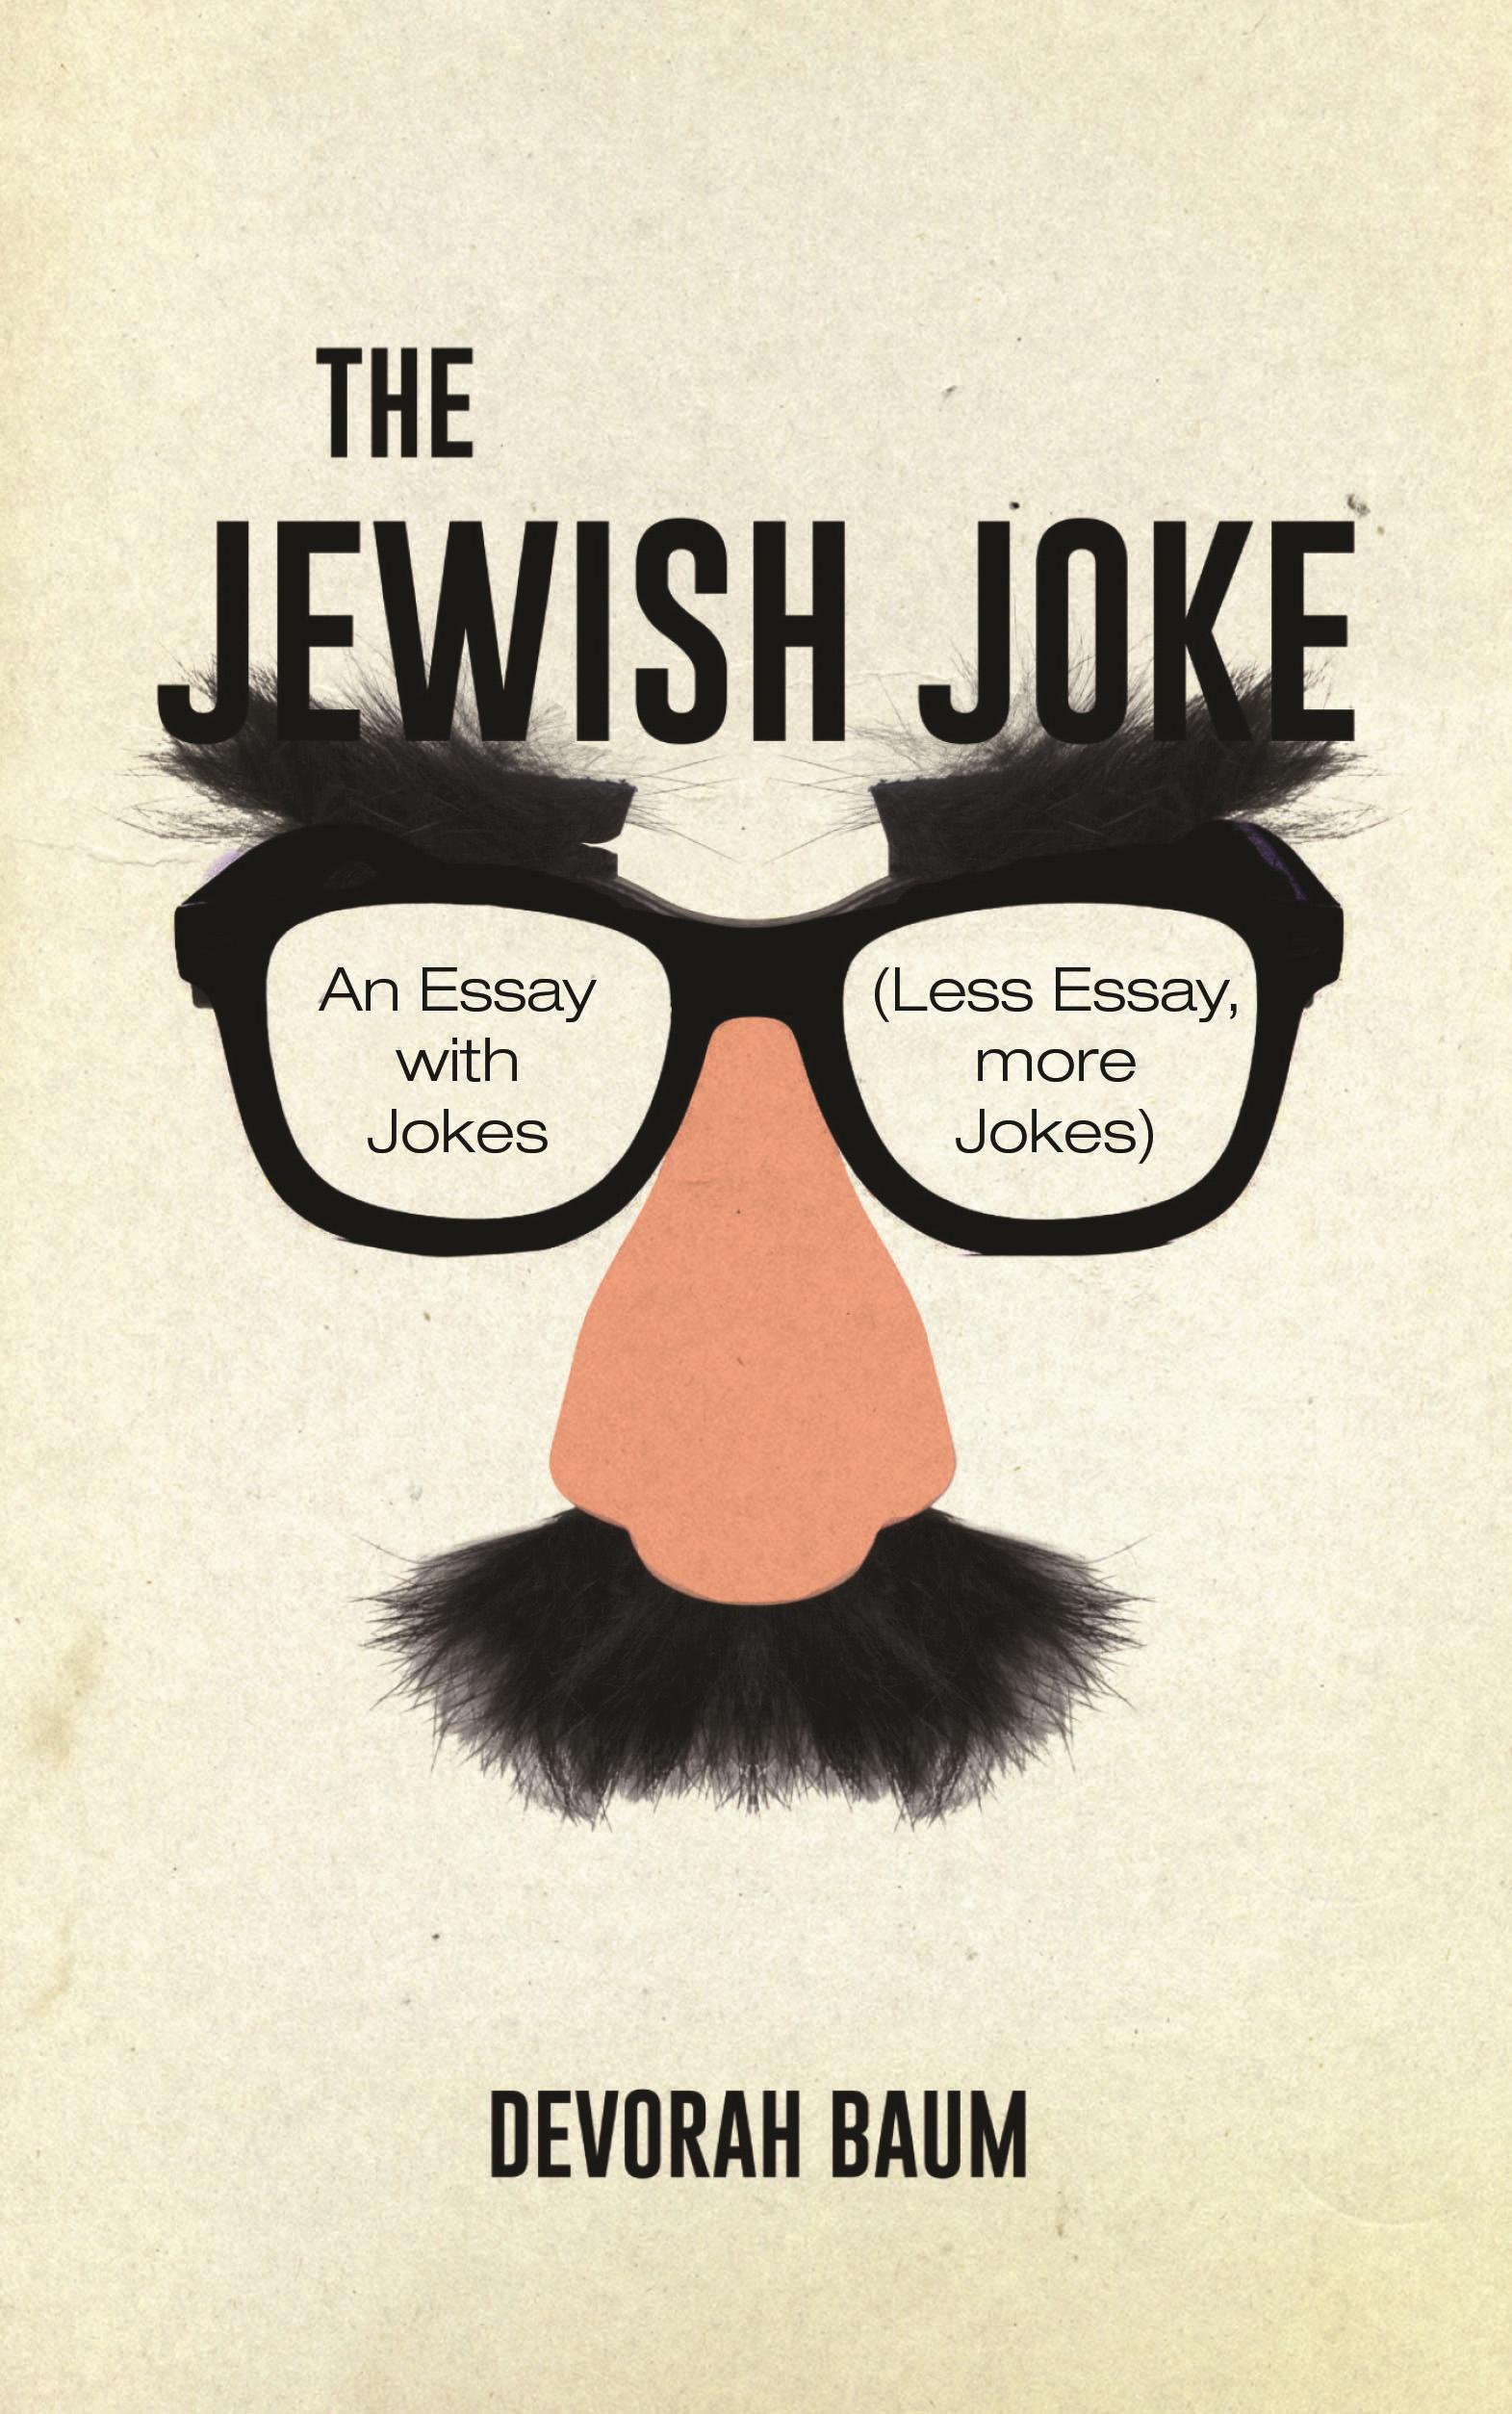 018 Essay Joke Amazing Writer Joker In Hindi Jokes English Full